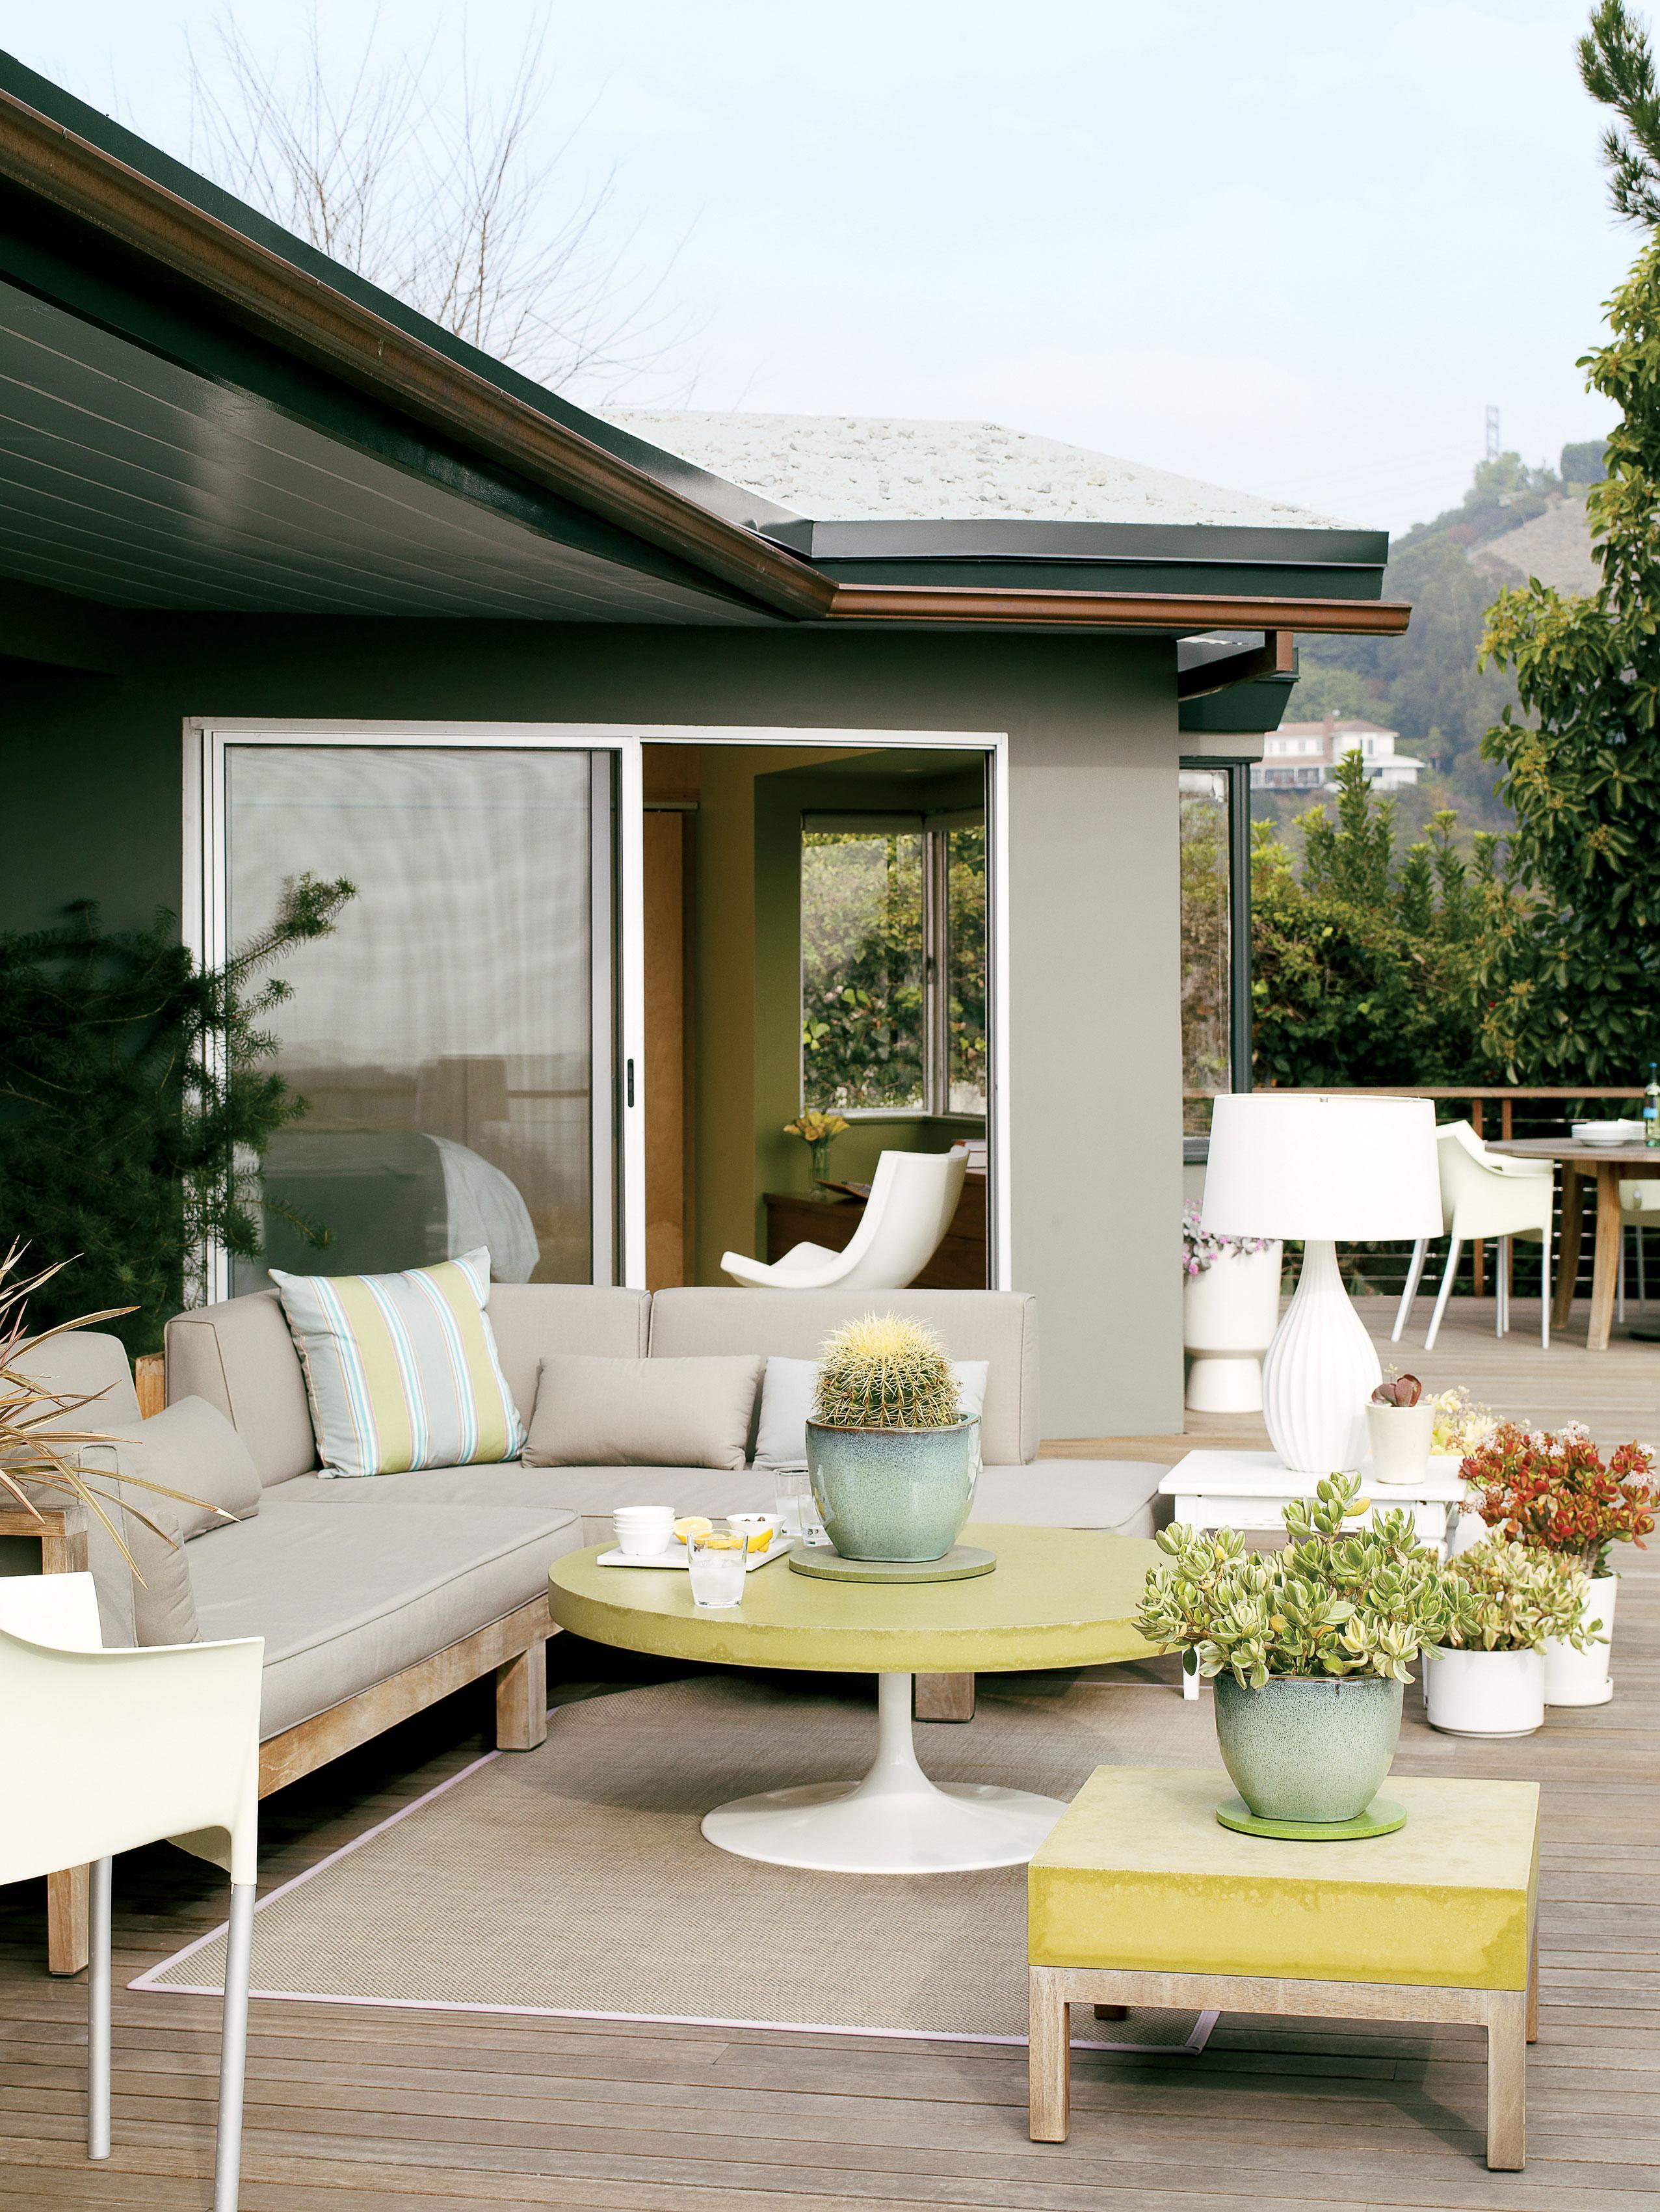 40 Great Ideas for Decks - Sunset Magazine